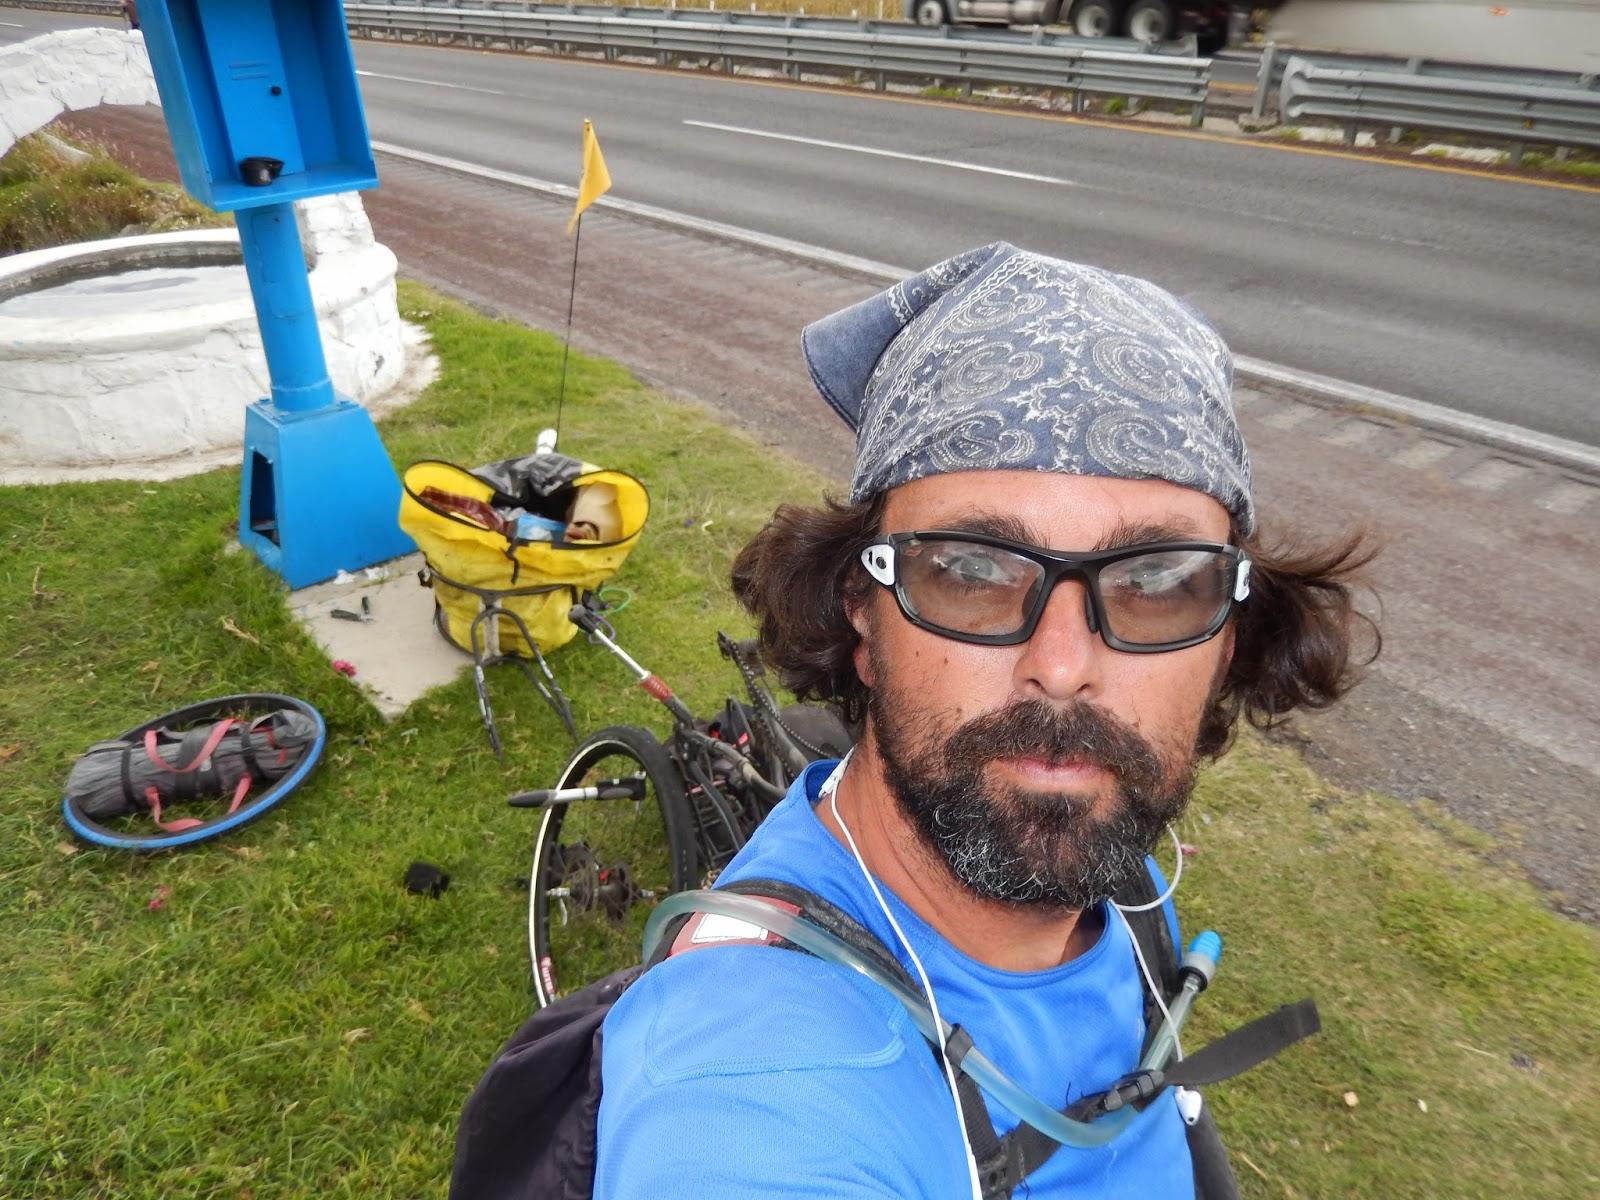 averia, pinchazo, cicloturismo, bob yak